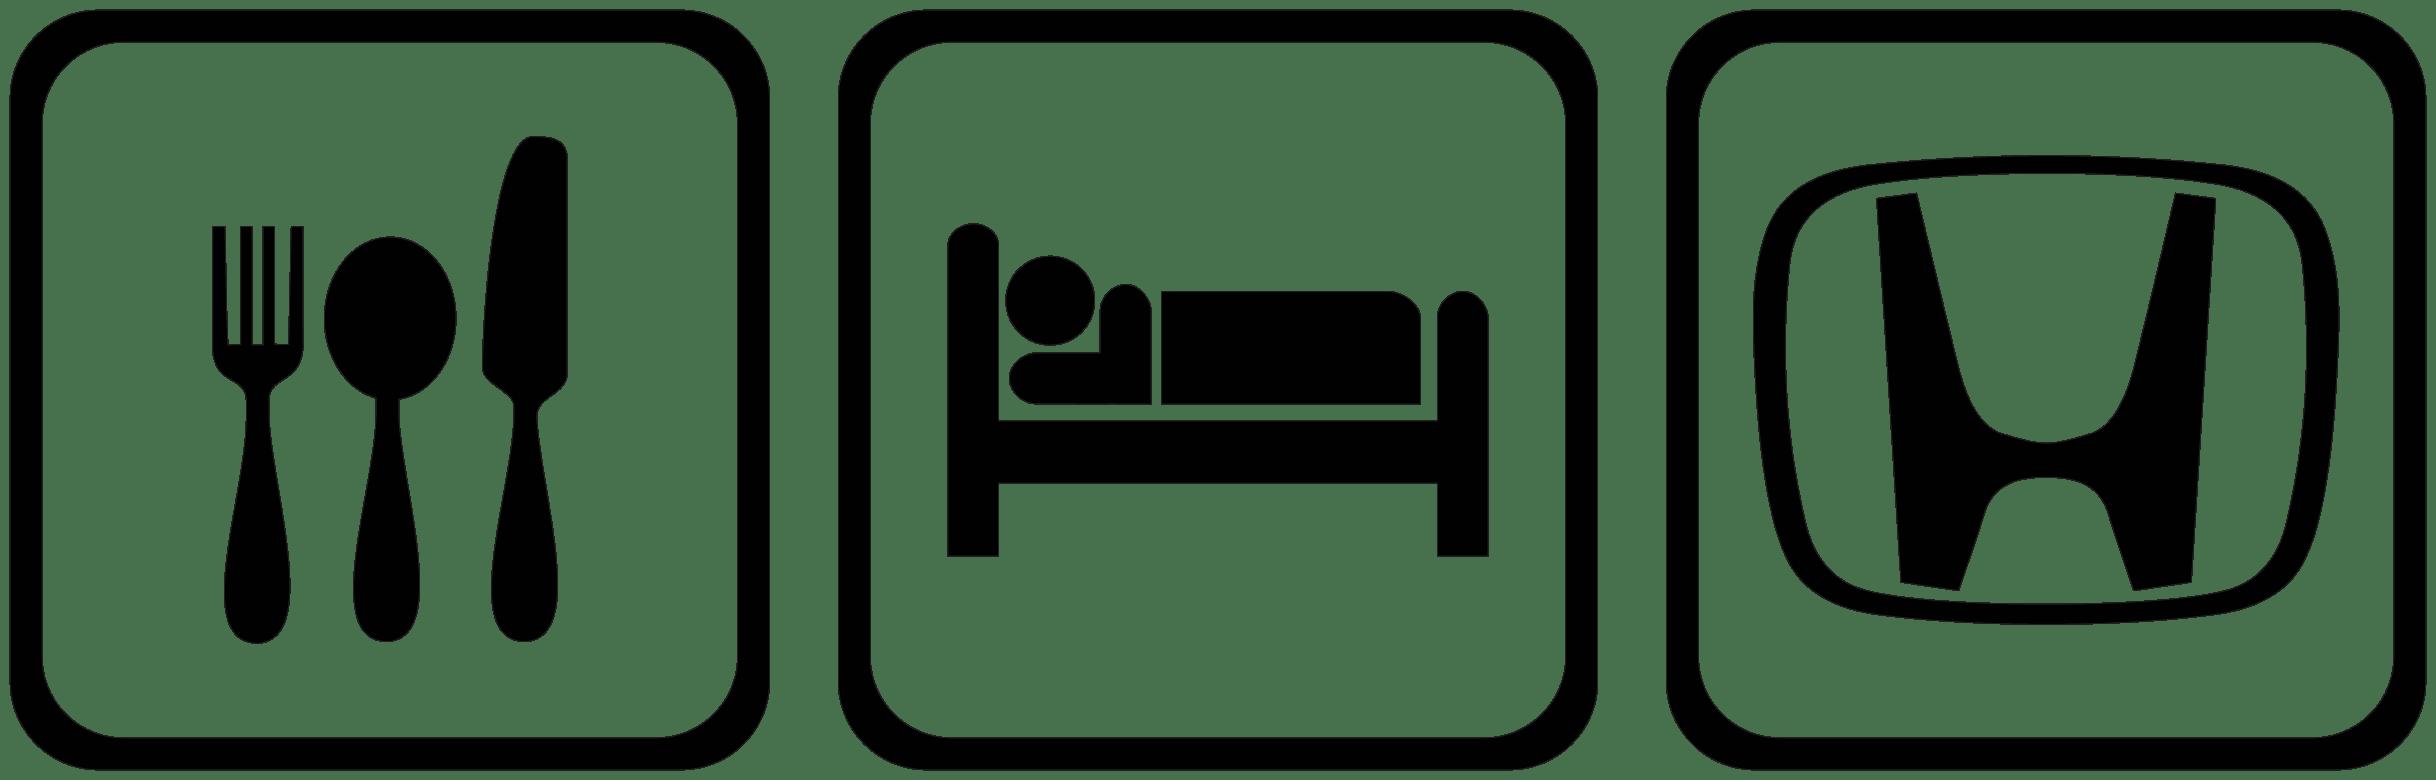 Eat sleep logo clipart best